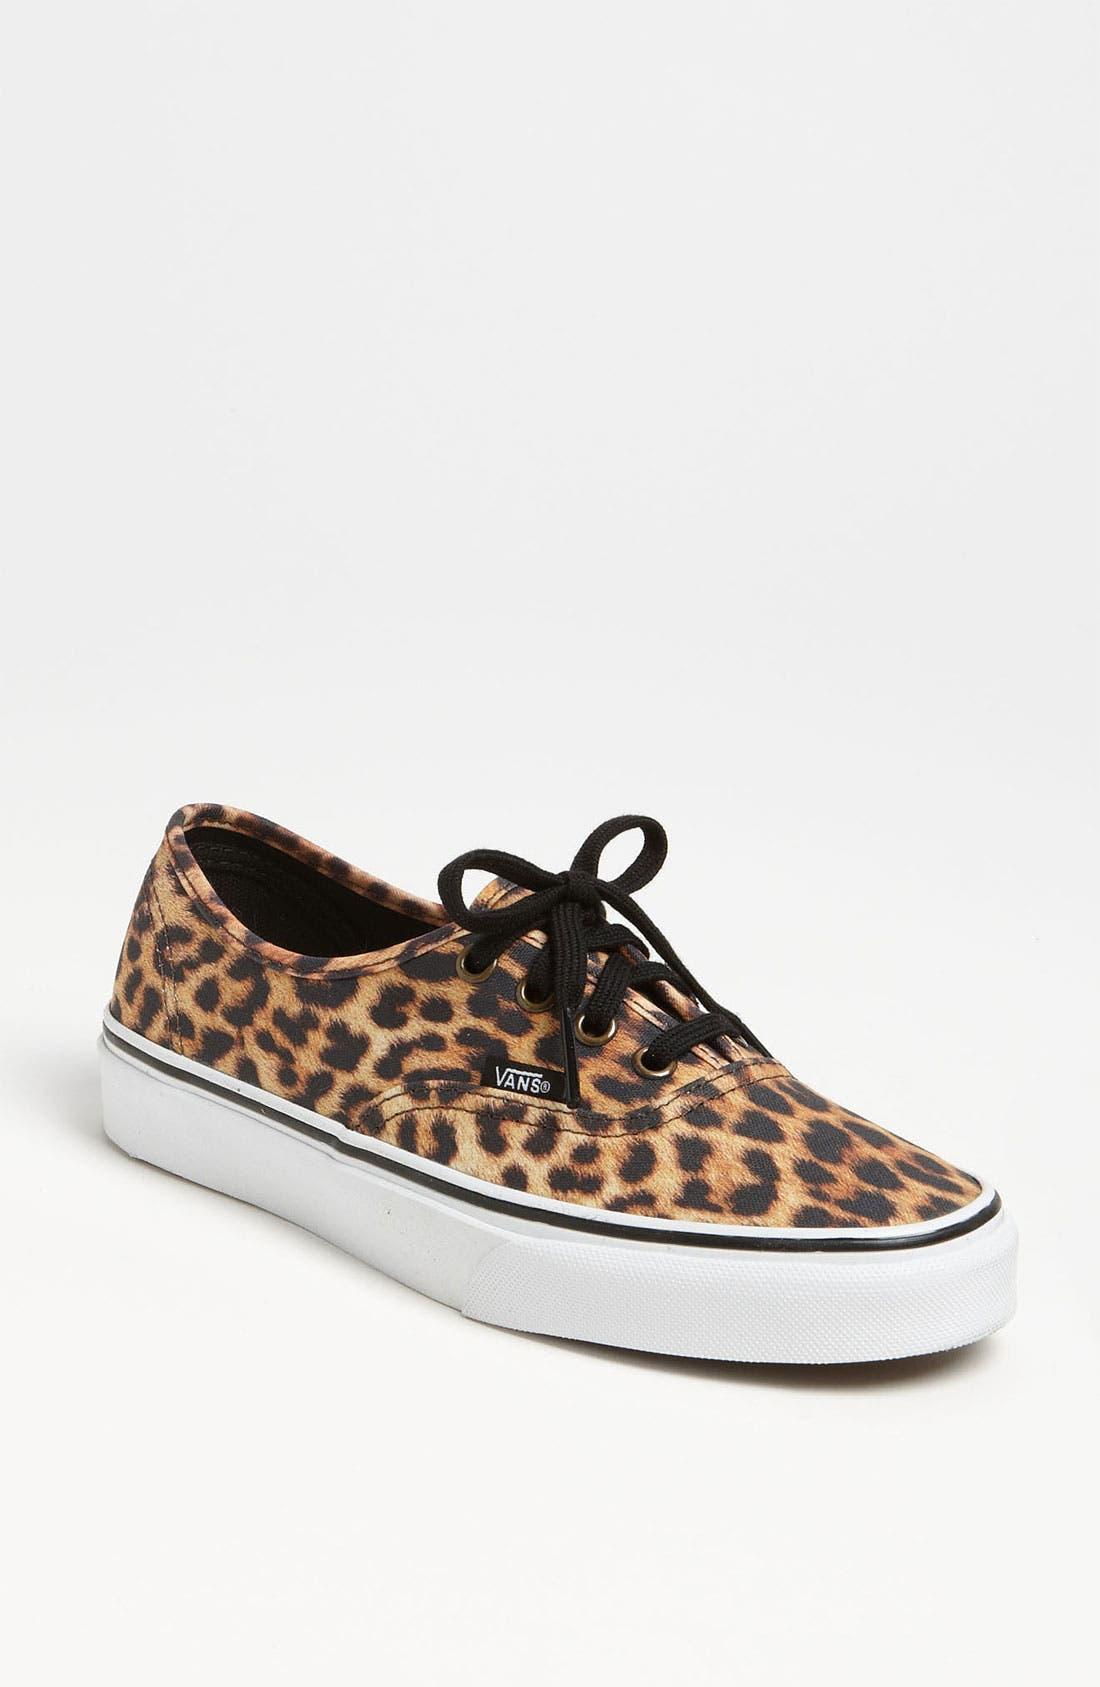 Main Image - Vans 'Authentic - Leopard' Sneaker (Women)